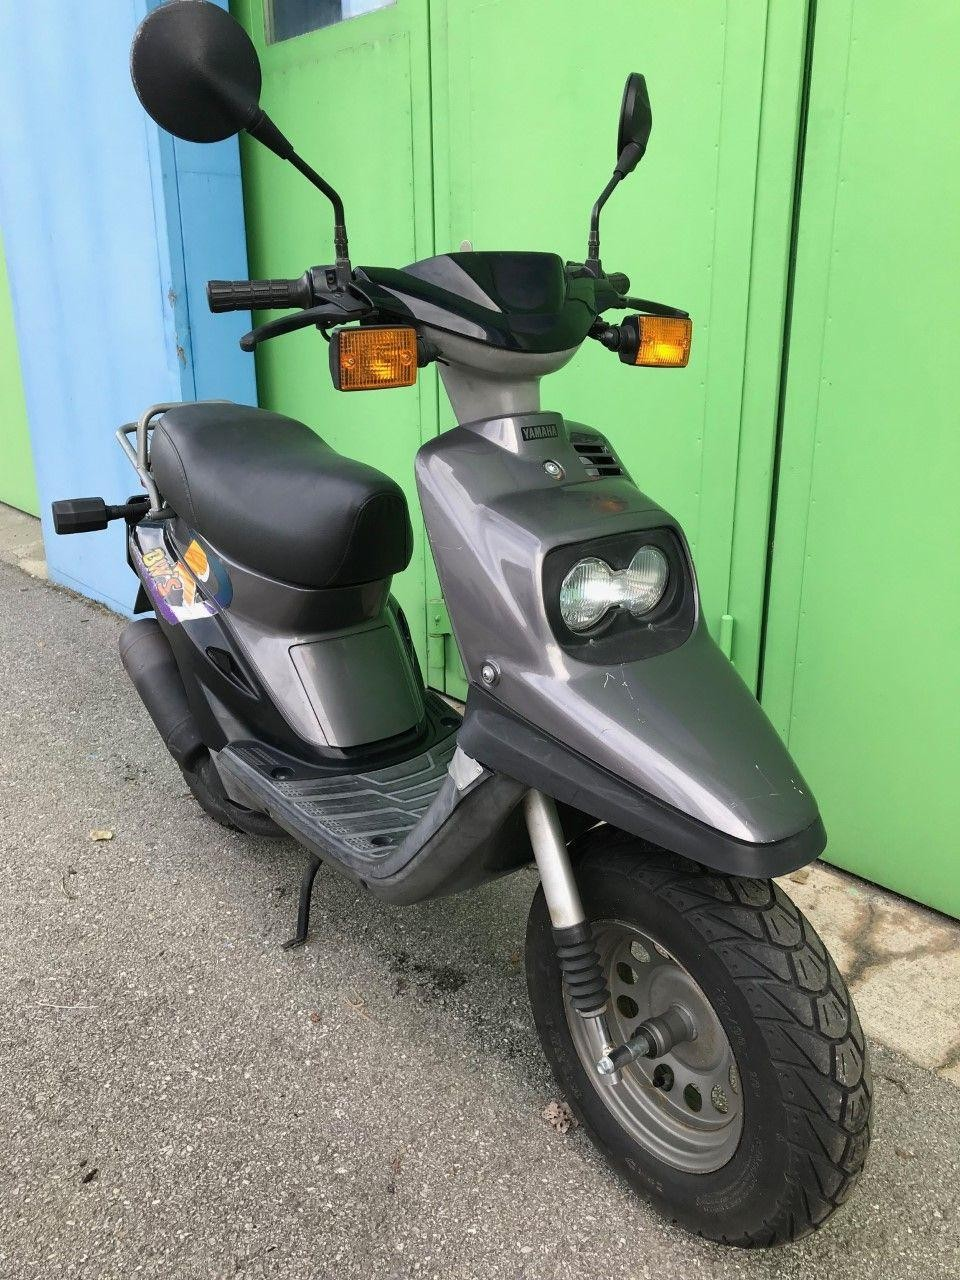 moto occasions acheter yamaha bws 50 45km h b renfaller moto shop brig gamsen. Black Bedroom Furniture Sets. Home Design Ideas